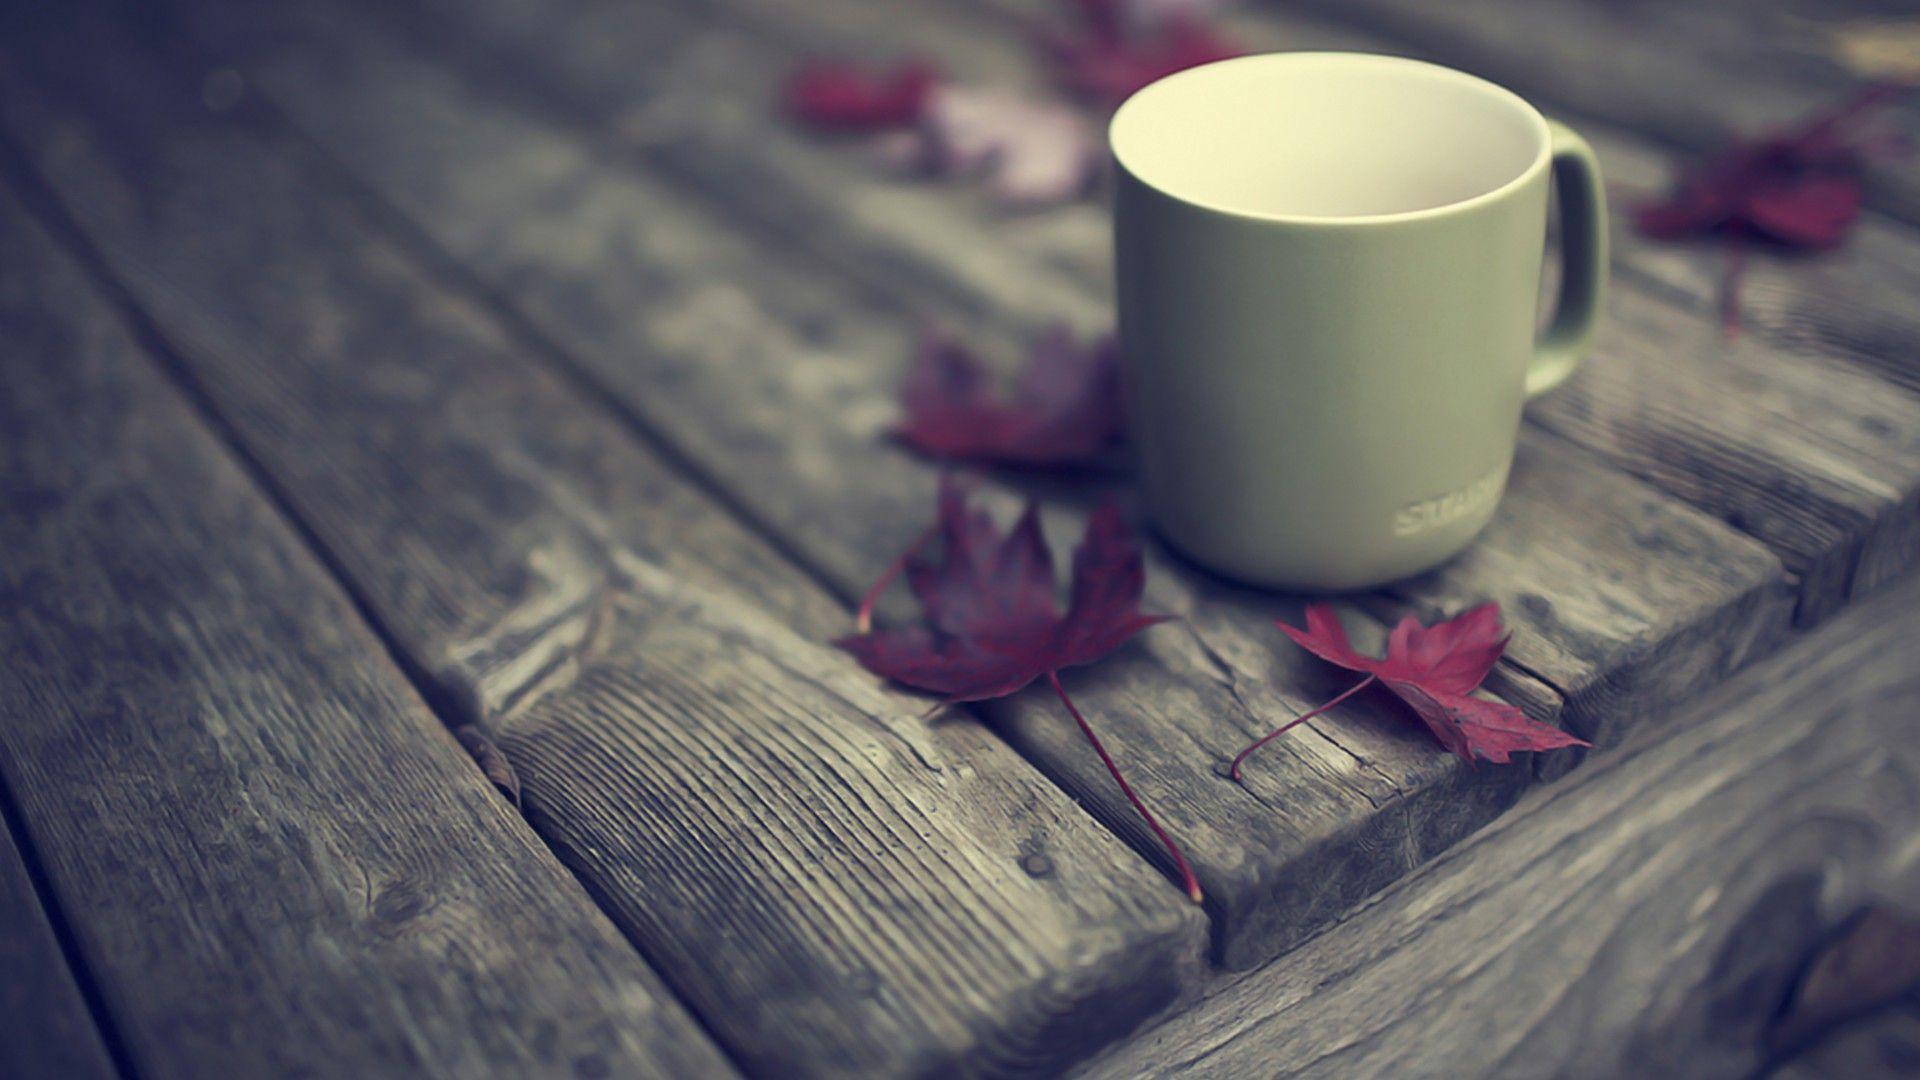 Fall Coffee Hd 1080p Wallpapers Download Kopi Fotografi Urban